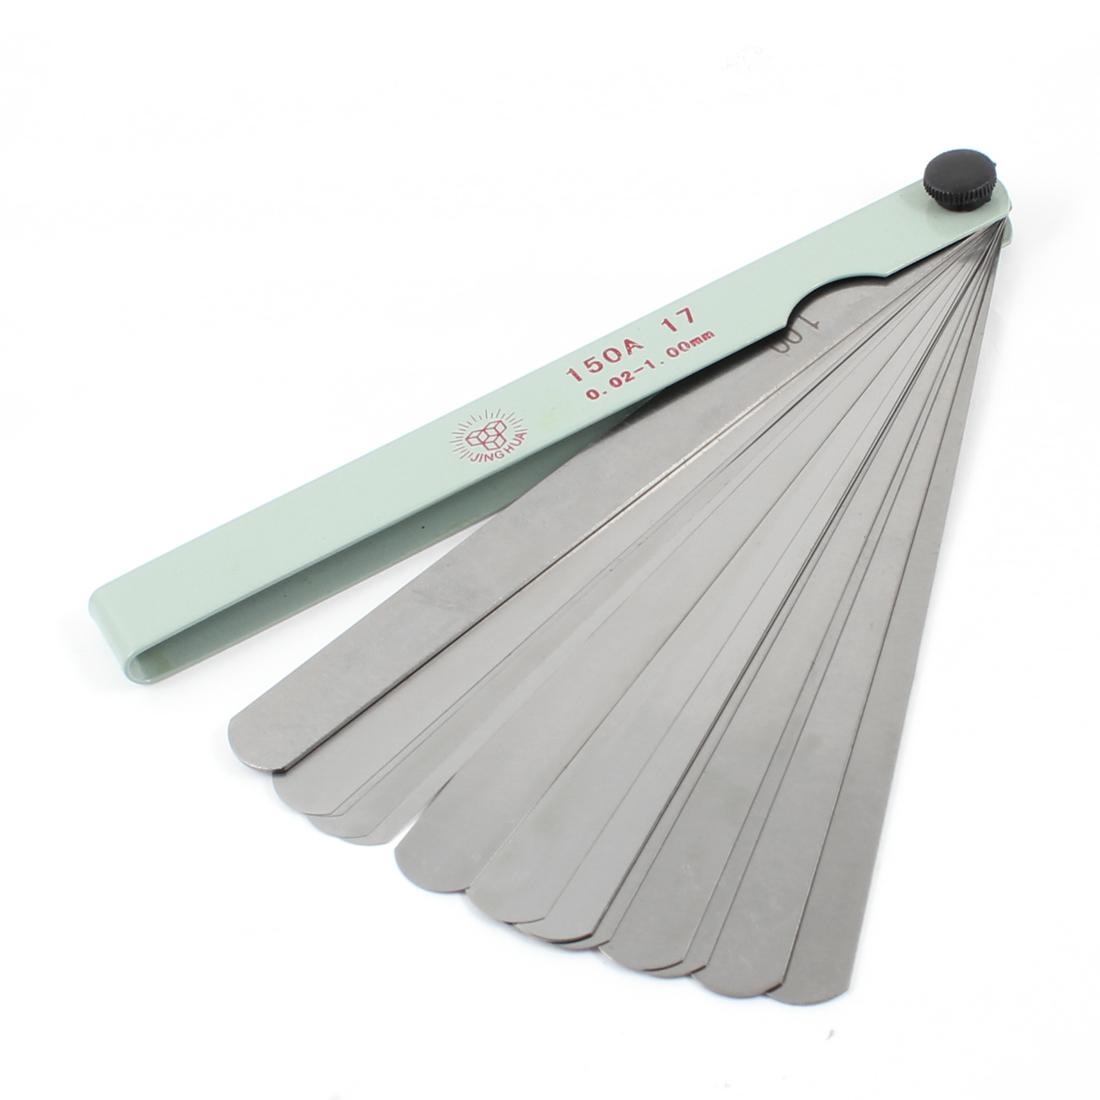 Measure Tool Metallic 0.02mm-1.00mm Thickness Feeler Gauge 17 in 1